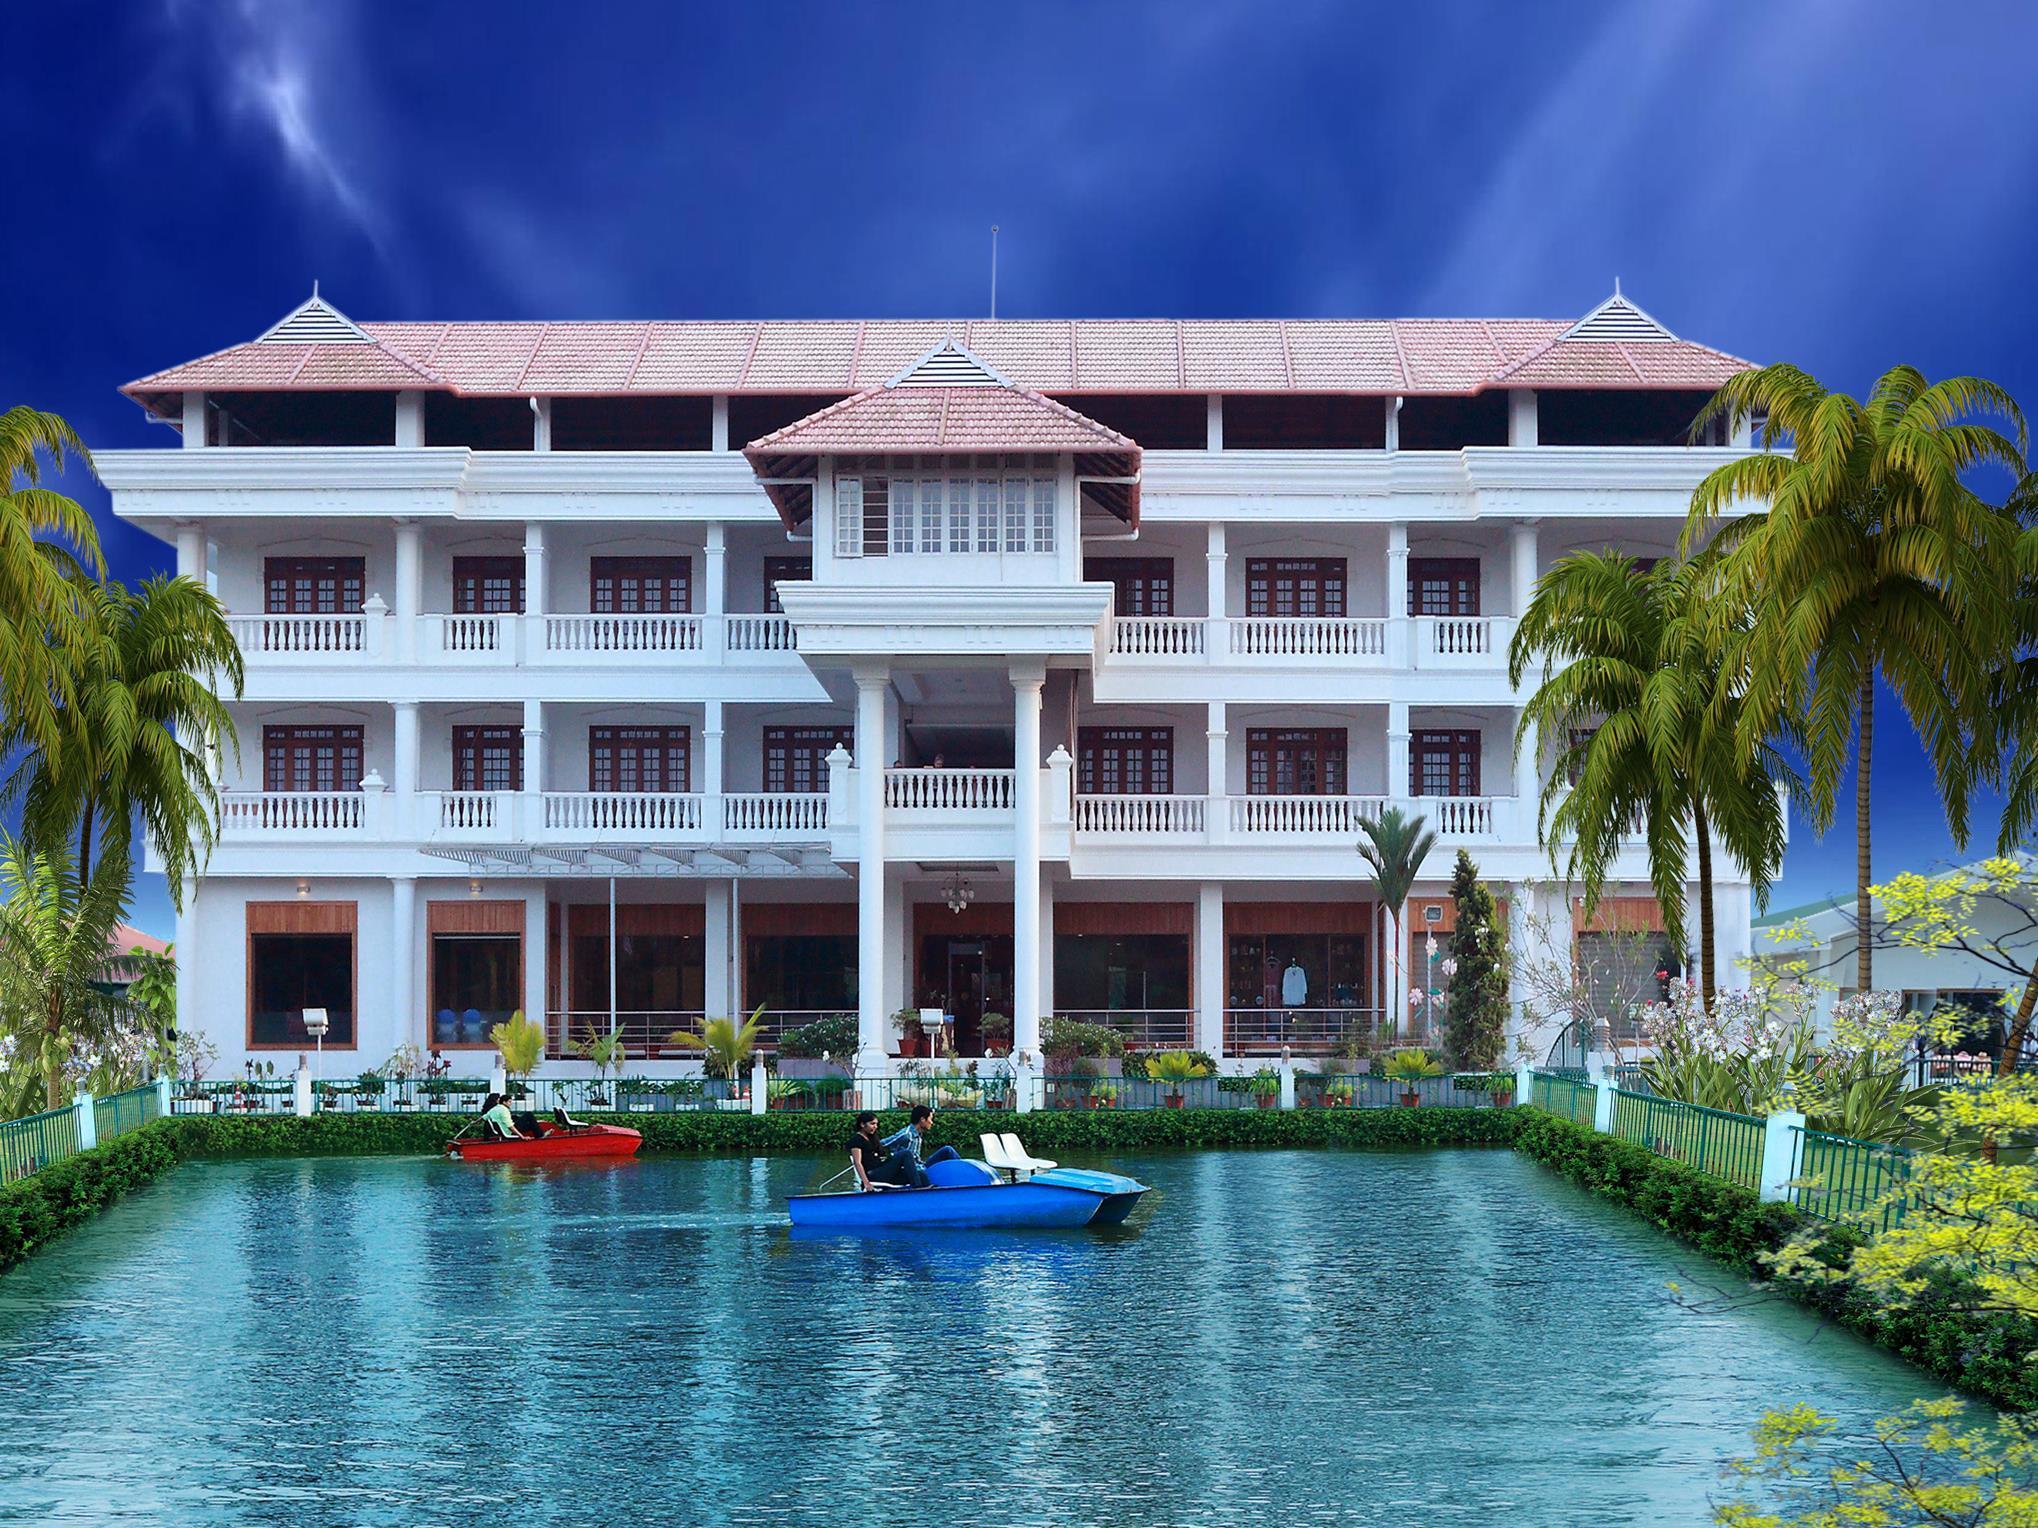 PJ Princess Regency Hotel - Kochi / Cochin